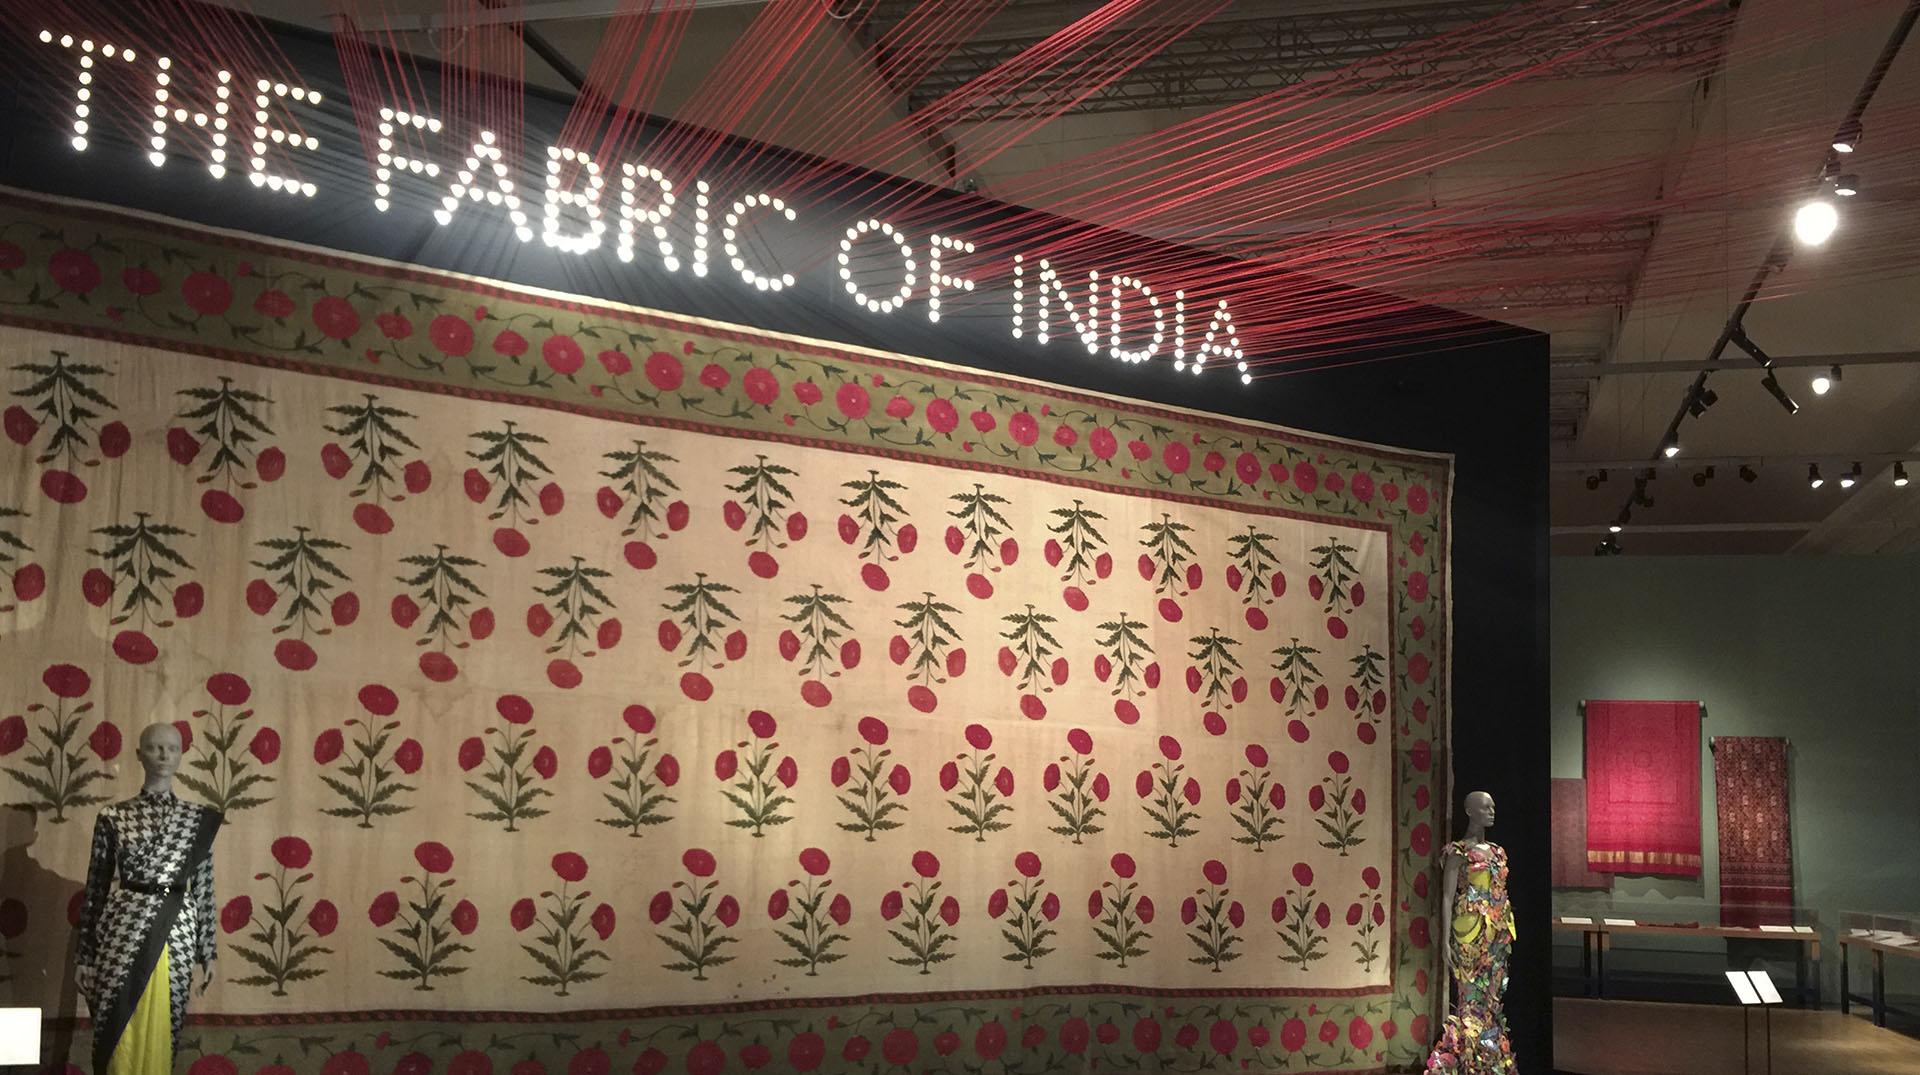 pll_fabric-of-india_01.jpg